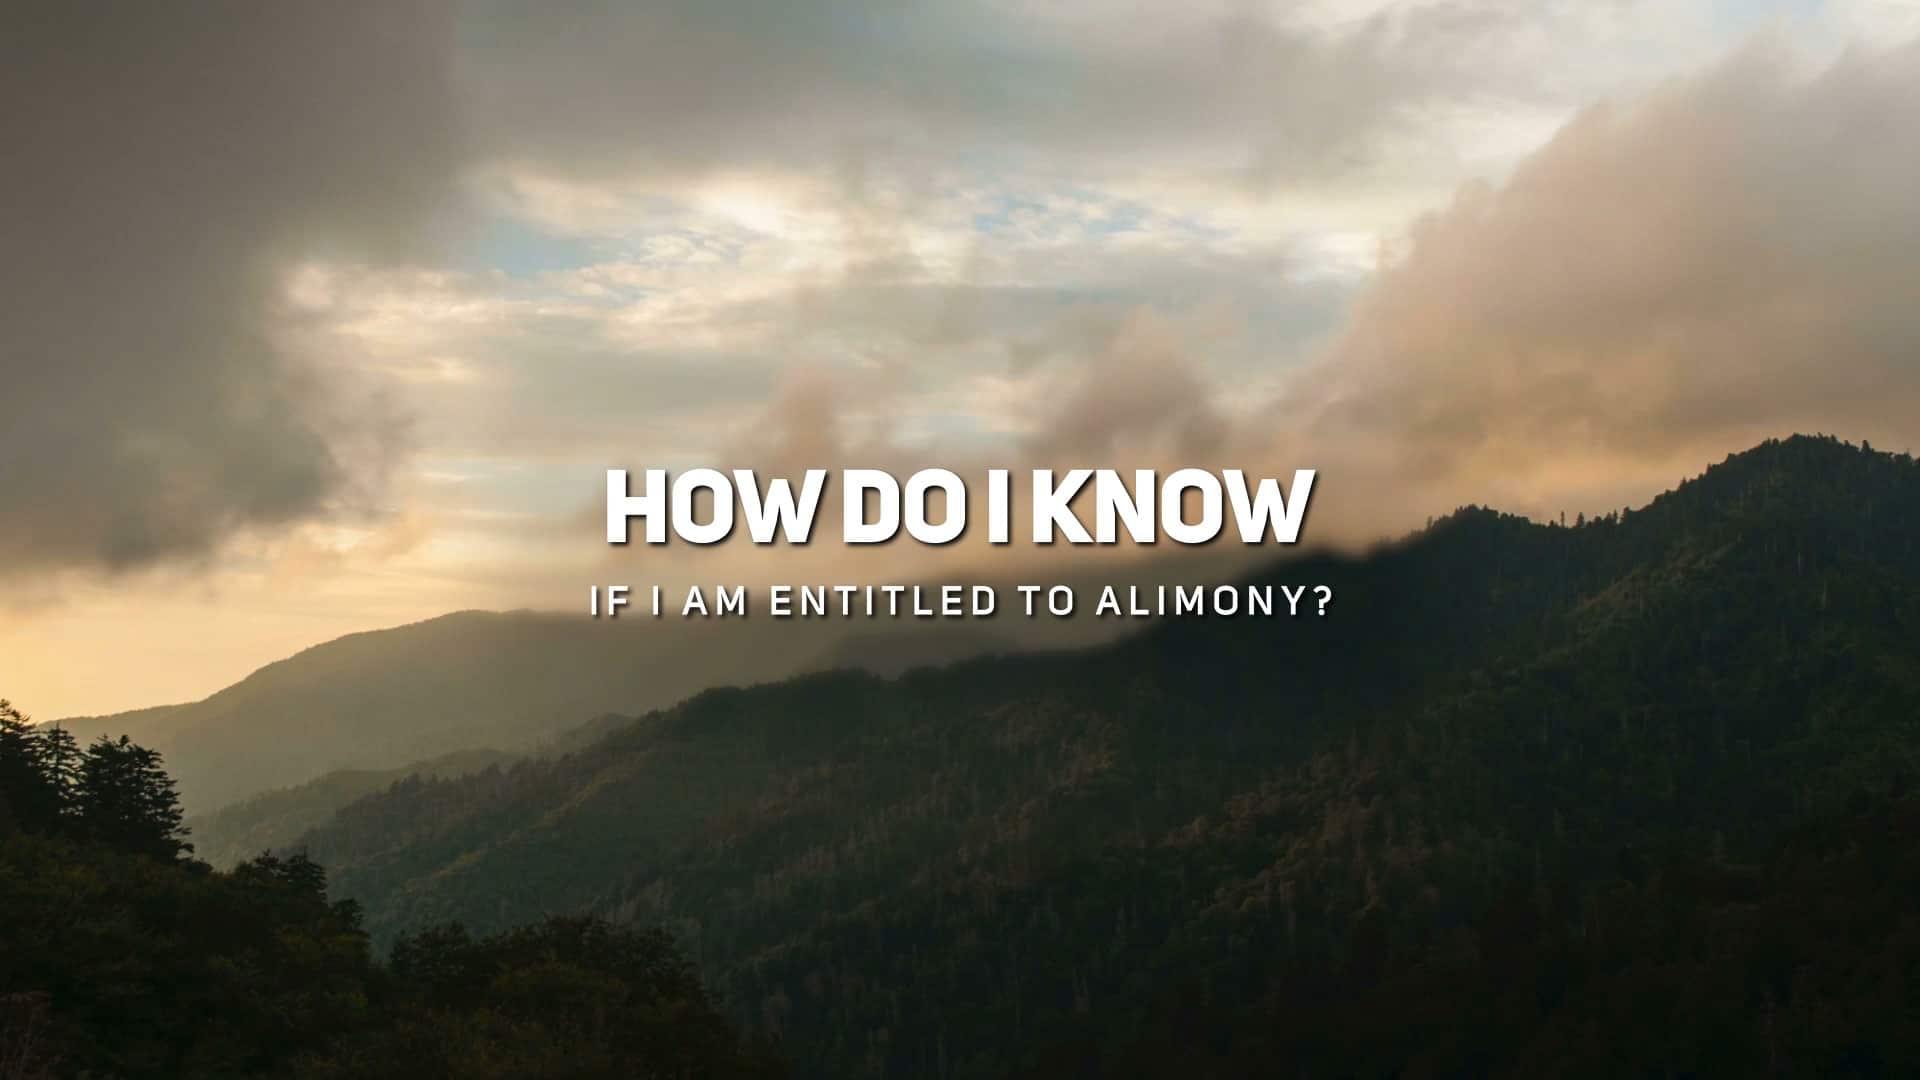 How Do I Know If I am Entitled to Alimony